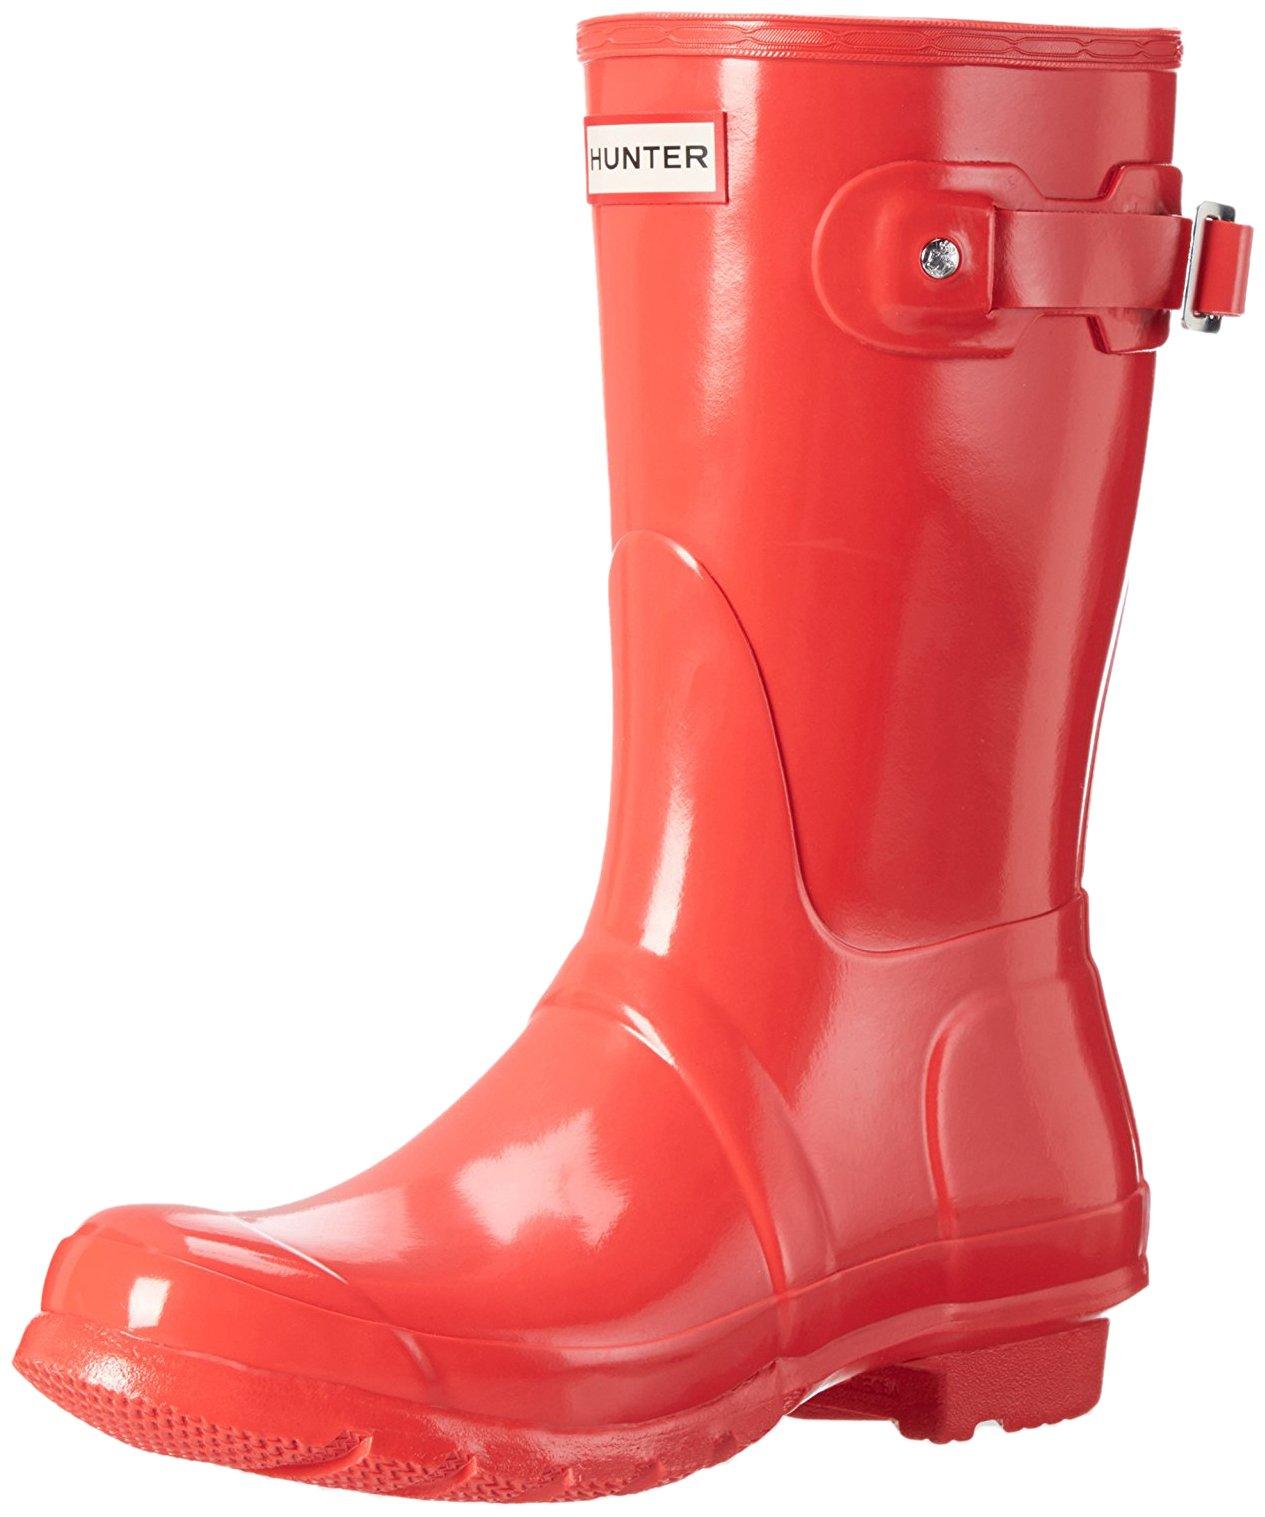 Hunter Women's Original Short Bright Coral Gloss Mid-Calf Rubber Boot - 6M